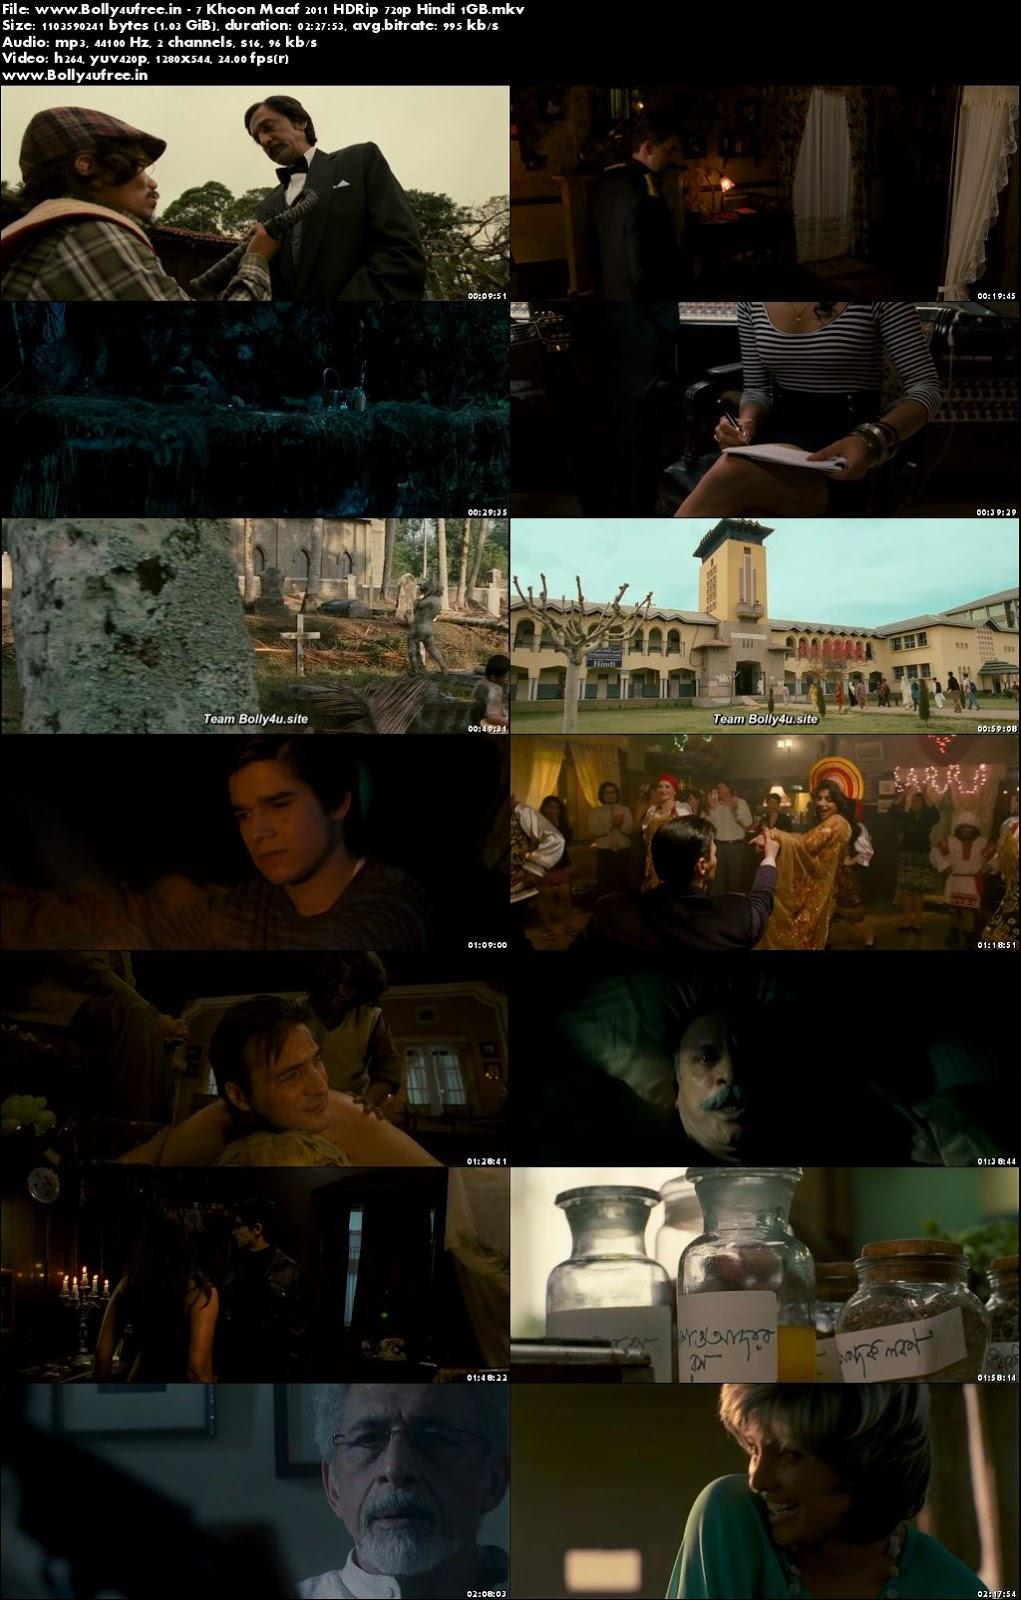 7 Khoon Maaf 2011 Hindi Full Movie Download HDRip 720p 1GB